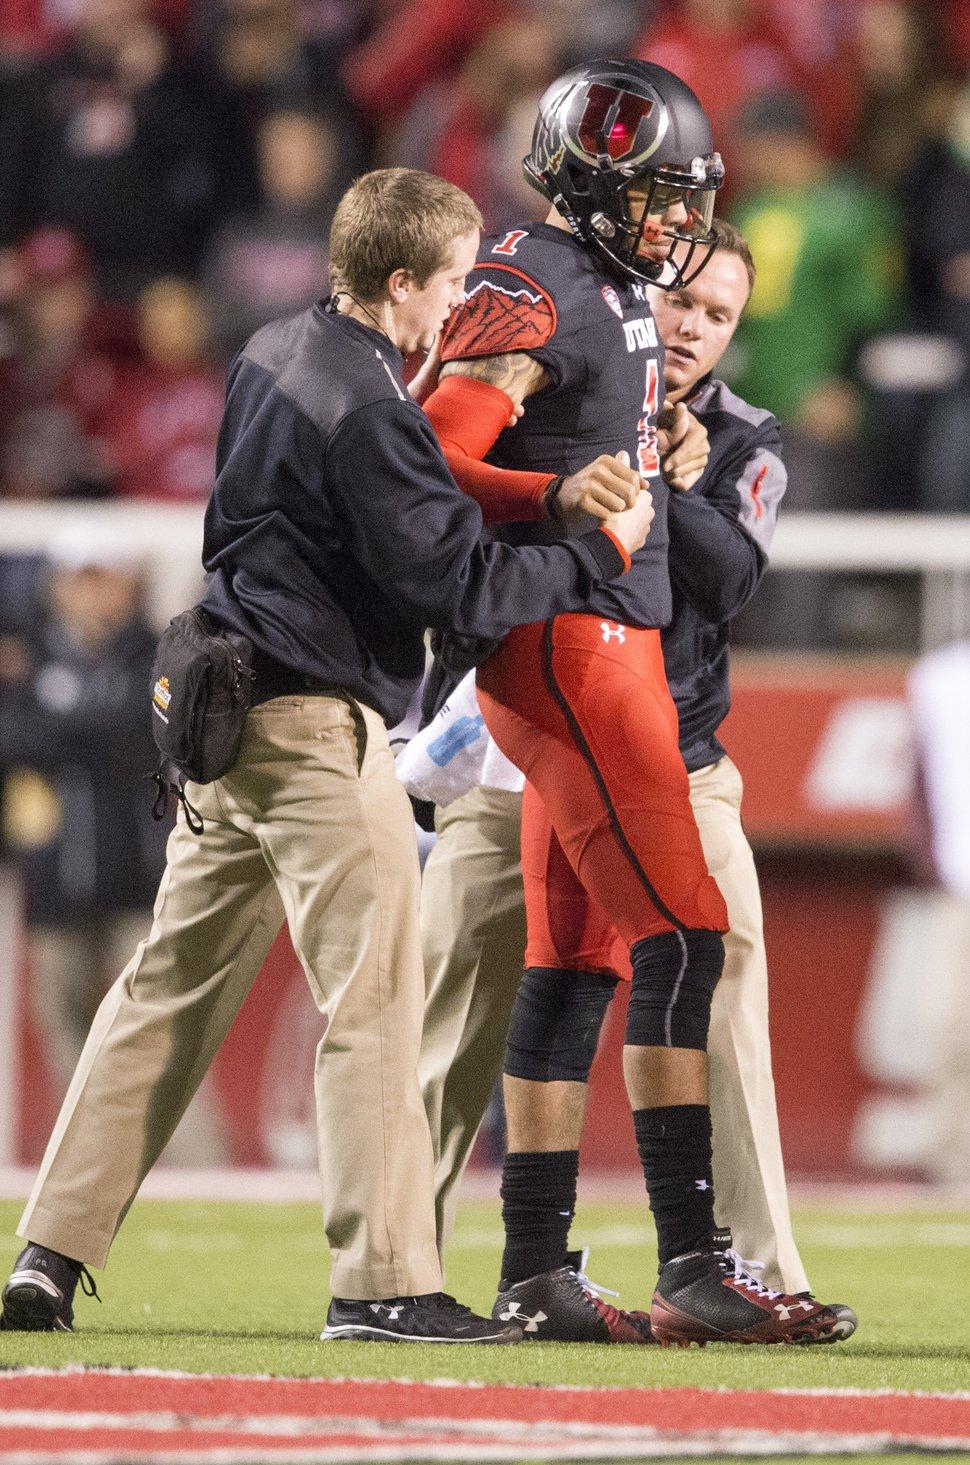 Rick Egan | The Salt Lake Tribune Utah Utes quarterback Kendal Thompson (1) is helped off the field, in PAC-12 action, Utah vs. Oregon game, at Rice-Eccles Stadium, Saturday, November 8, 2014